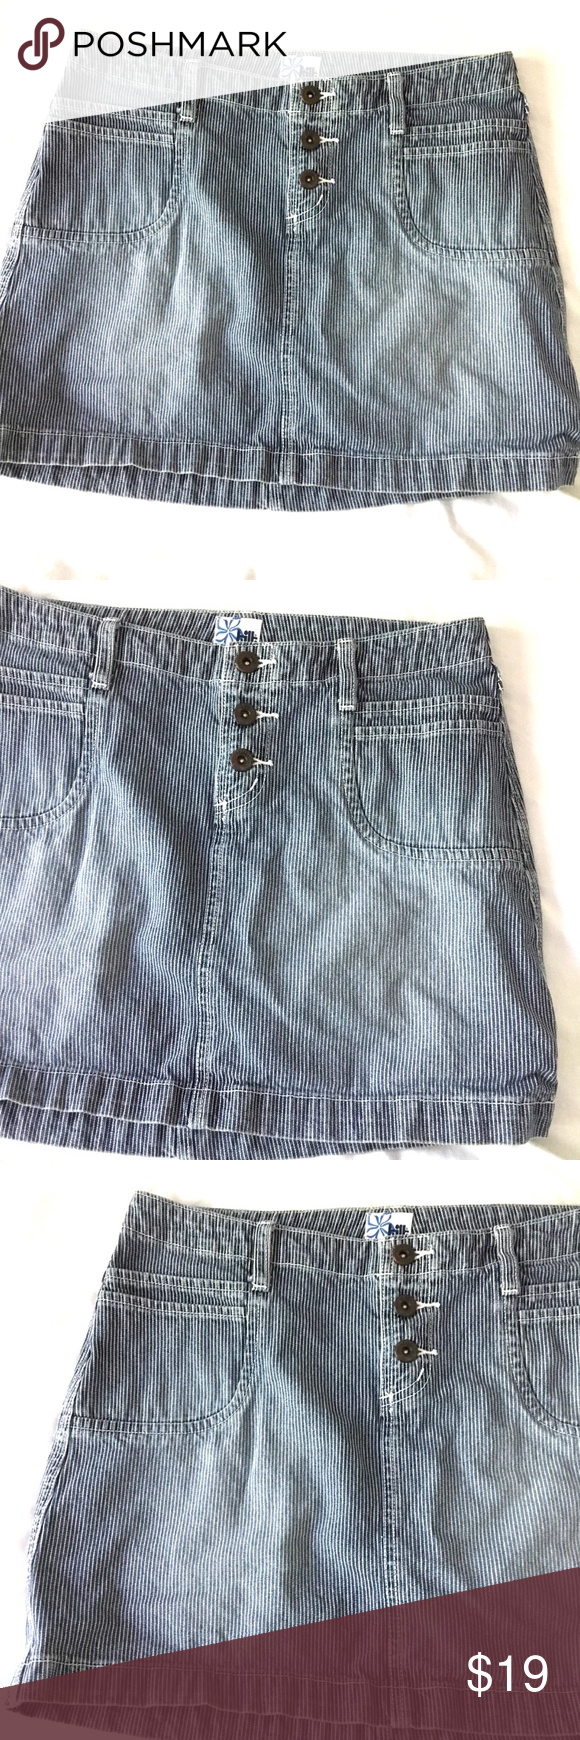 8e2549d907 Retro Striped Mini Jean Skirt GUC Comes from smoke free home 15in Waist -  15in Length TILT Skirts Mini